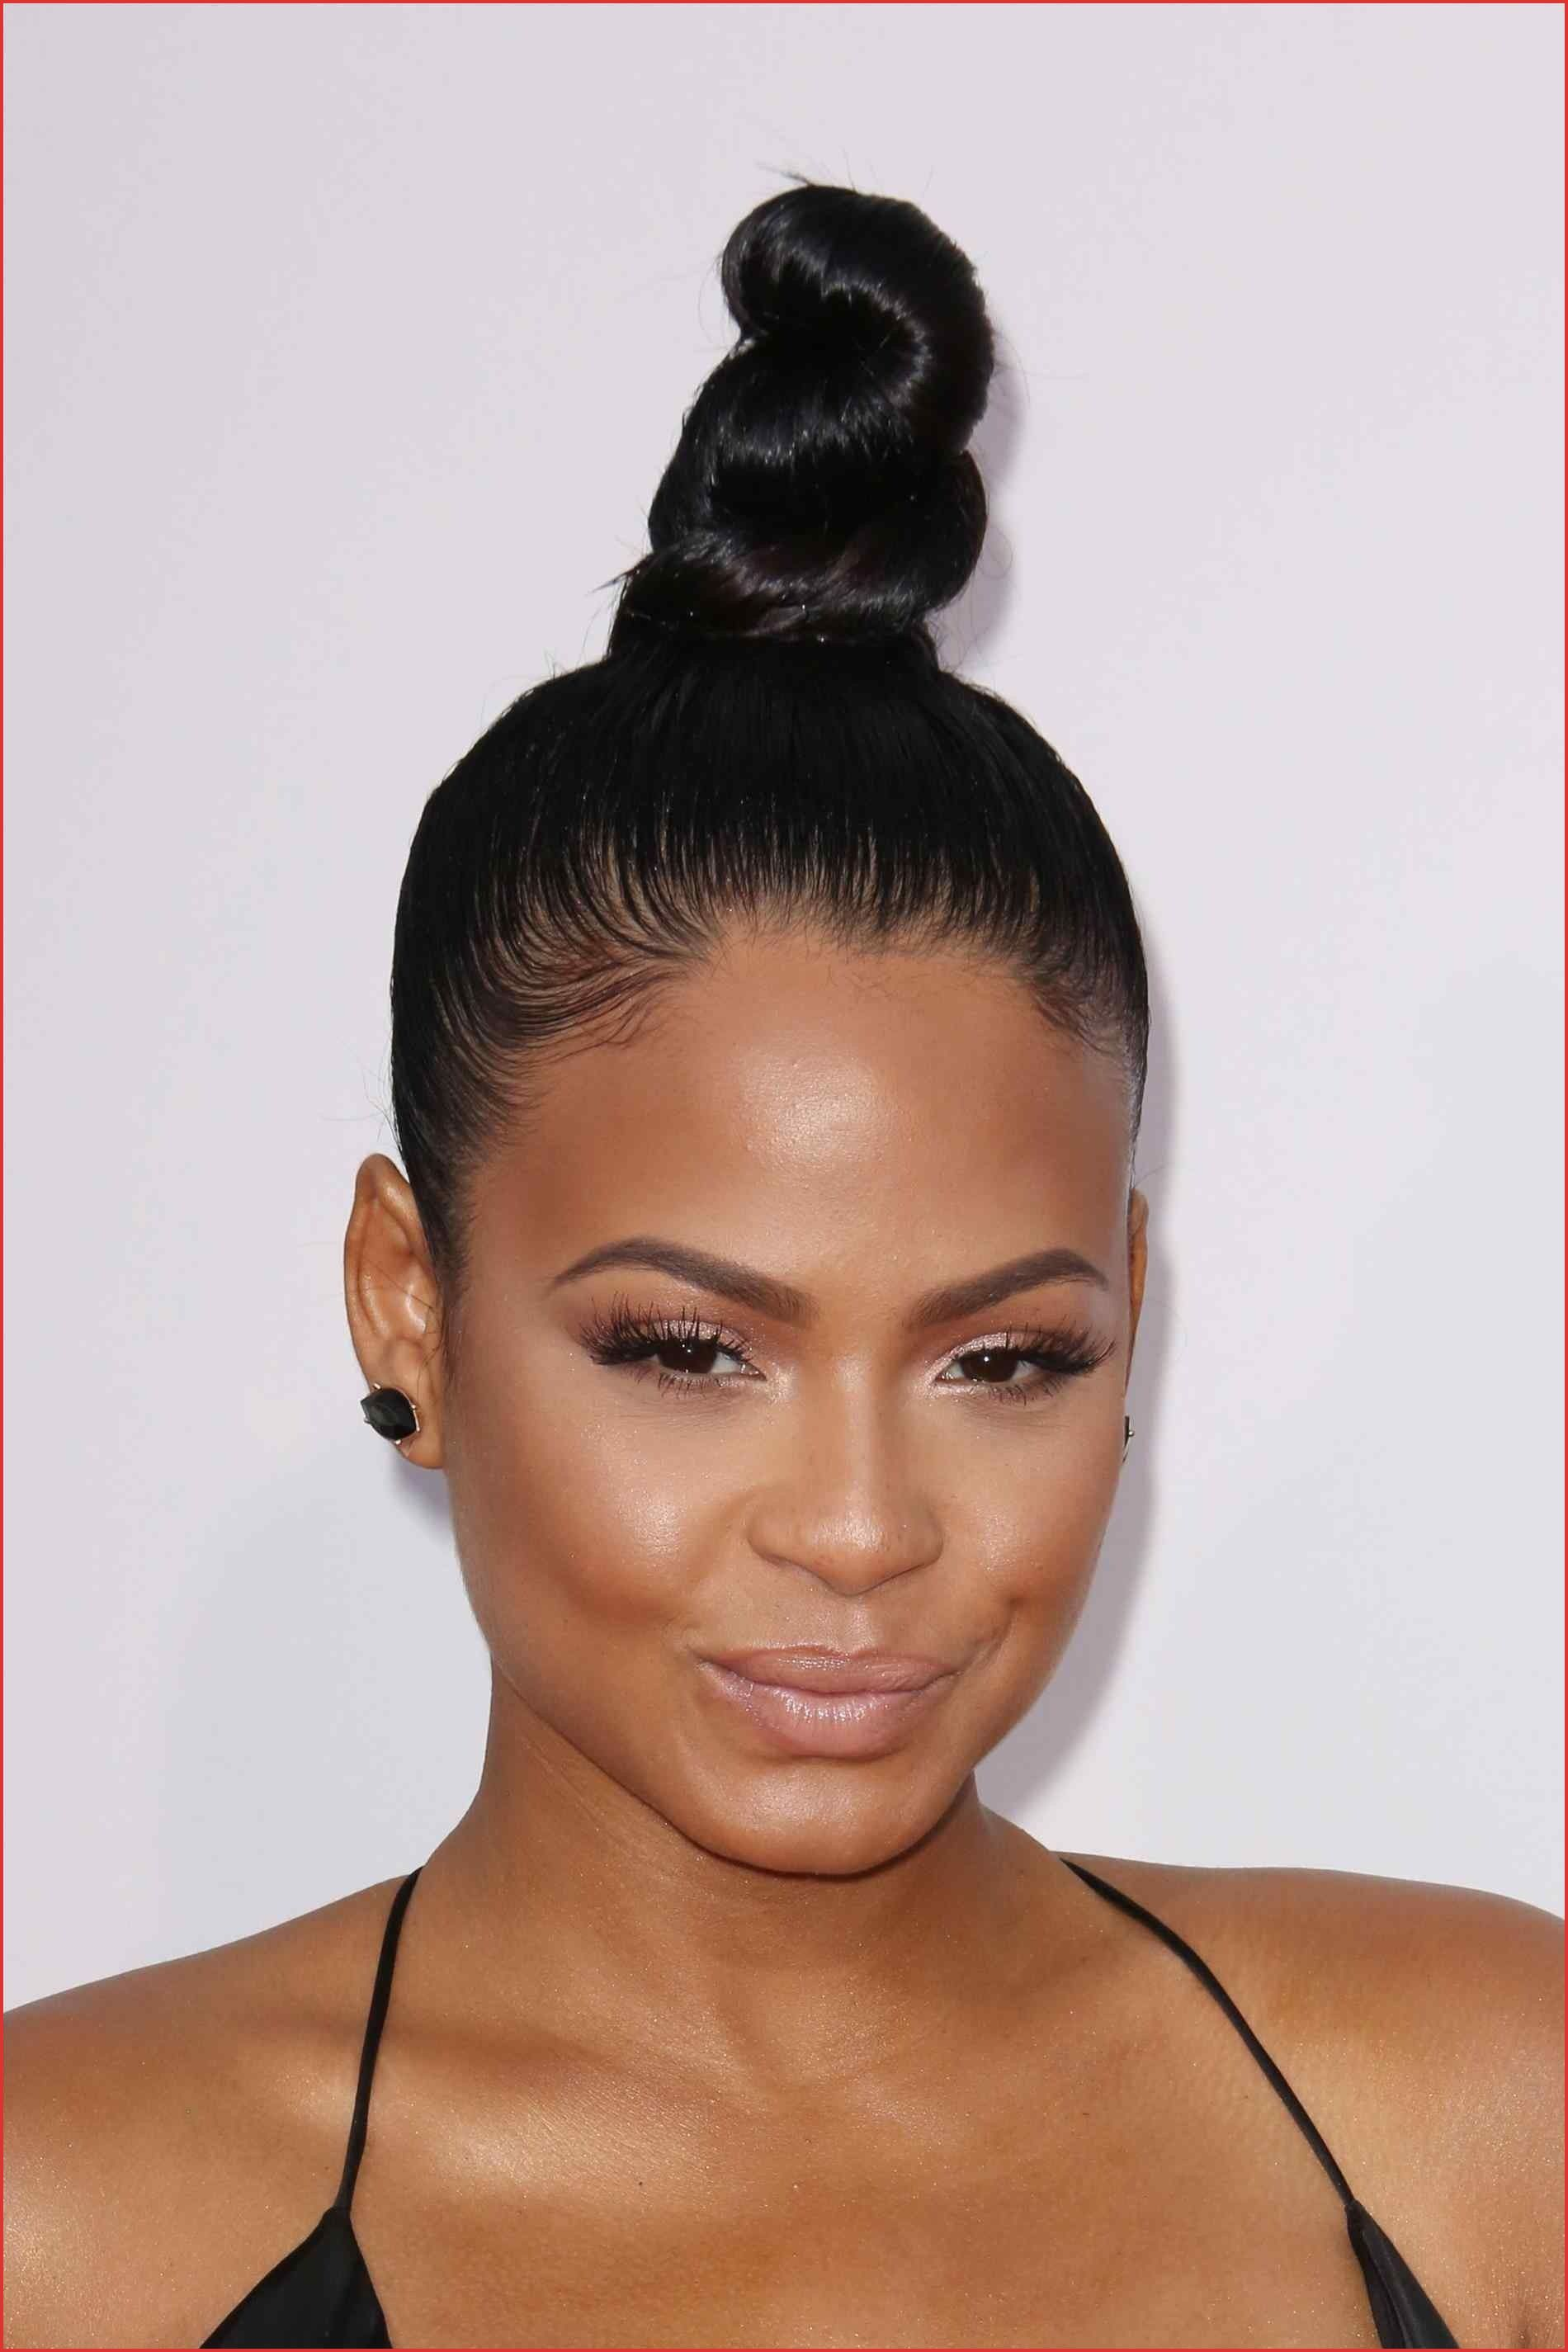 Id Code For Roblox Black Messy Bun Icalliance Hairscrunchieholder Hairscrunchiesdiy Hairsc In 2020 Top Knot Hairstyles Black Hair Bun High Ponytail Hairstyles